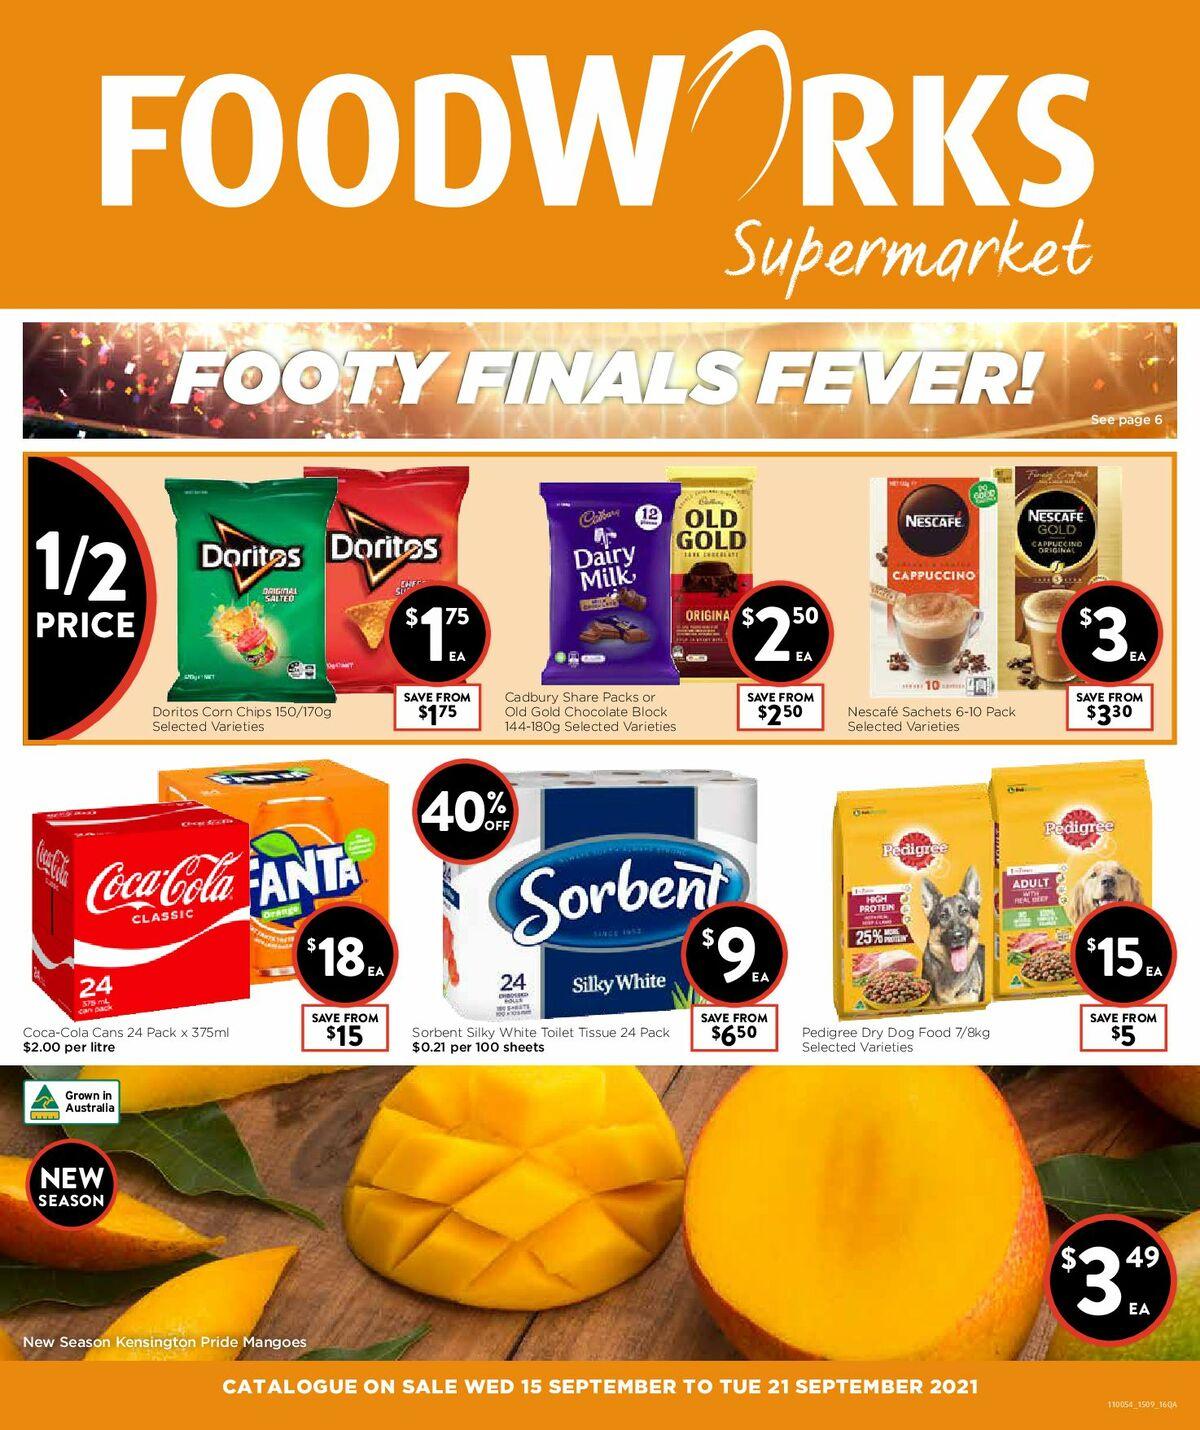 FoodWorks Supermarket Catalogues from September 15